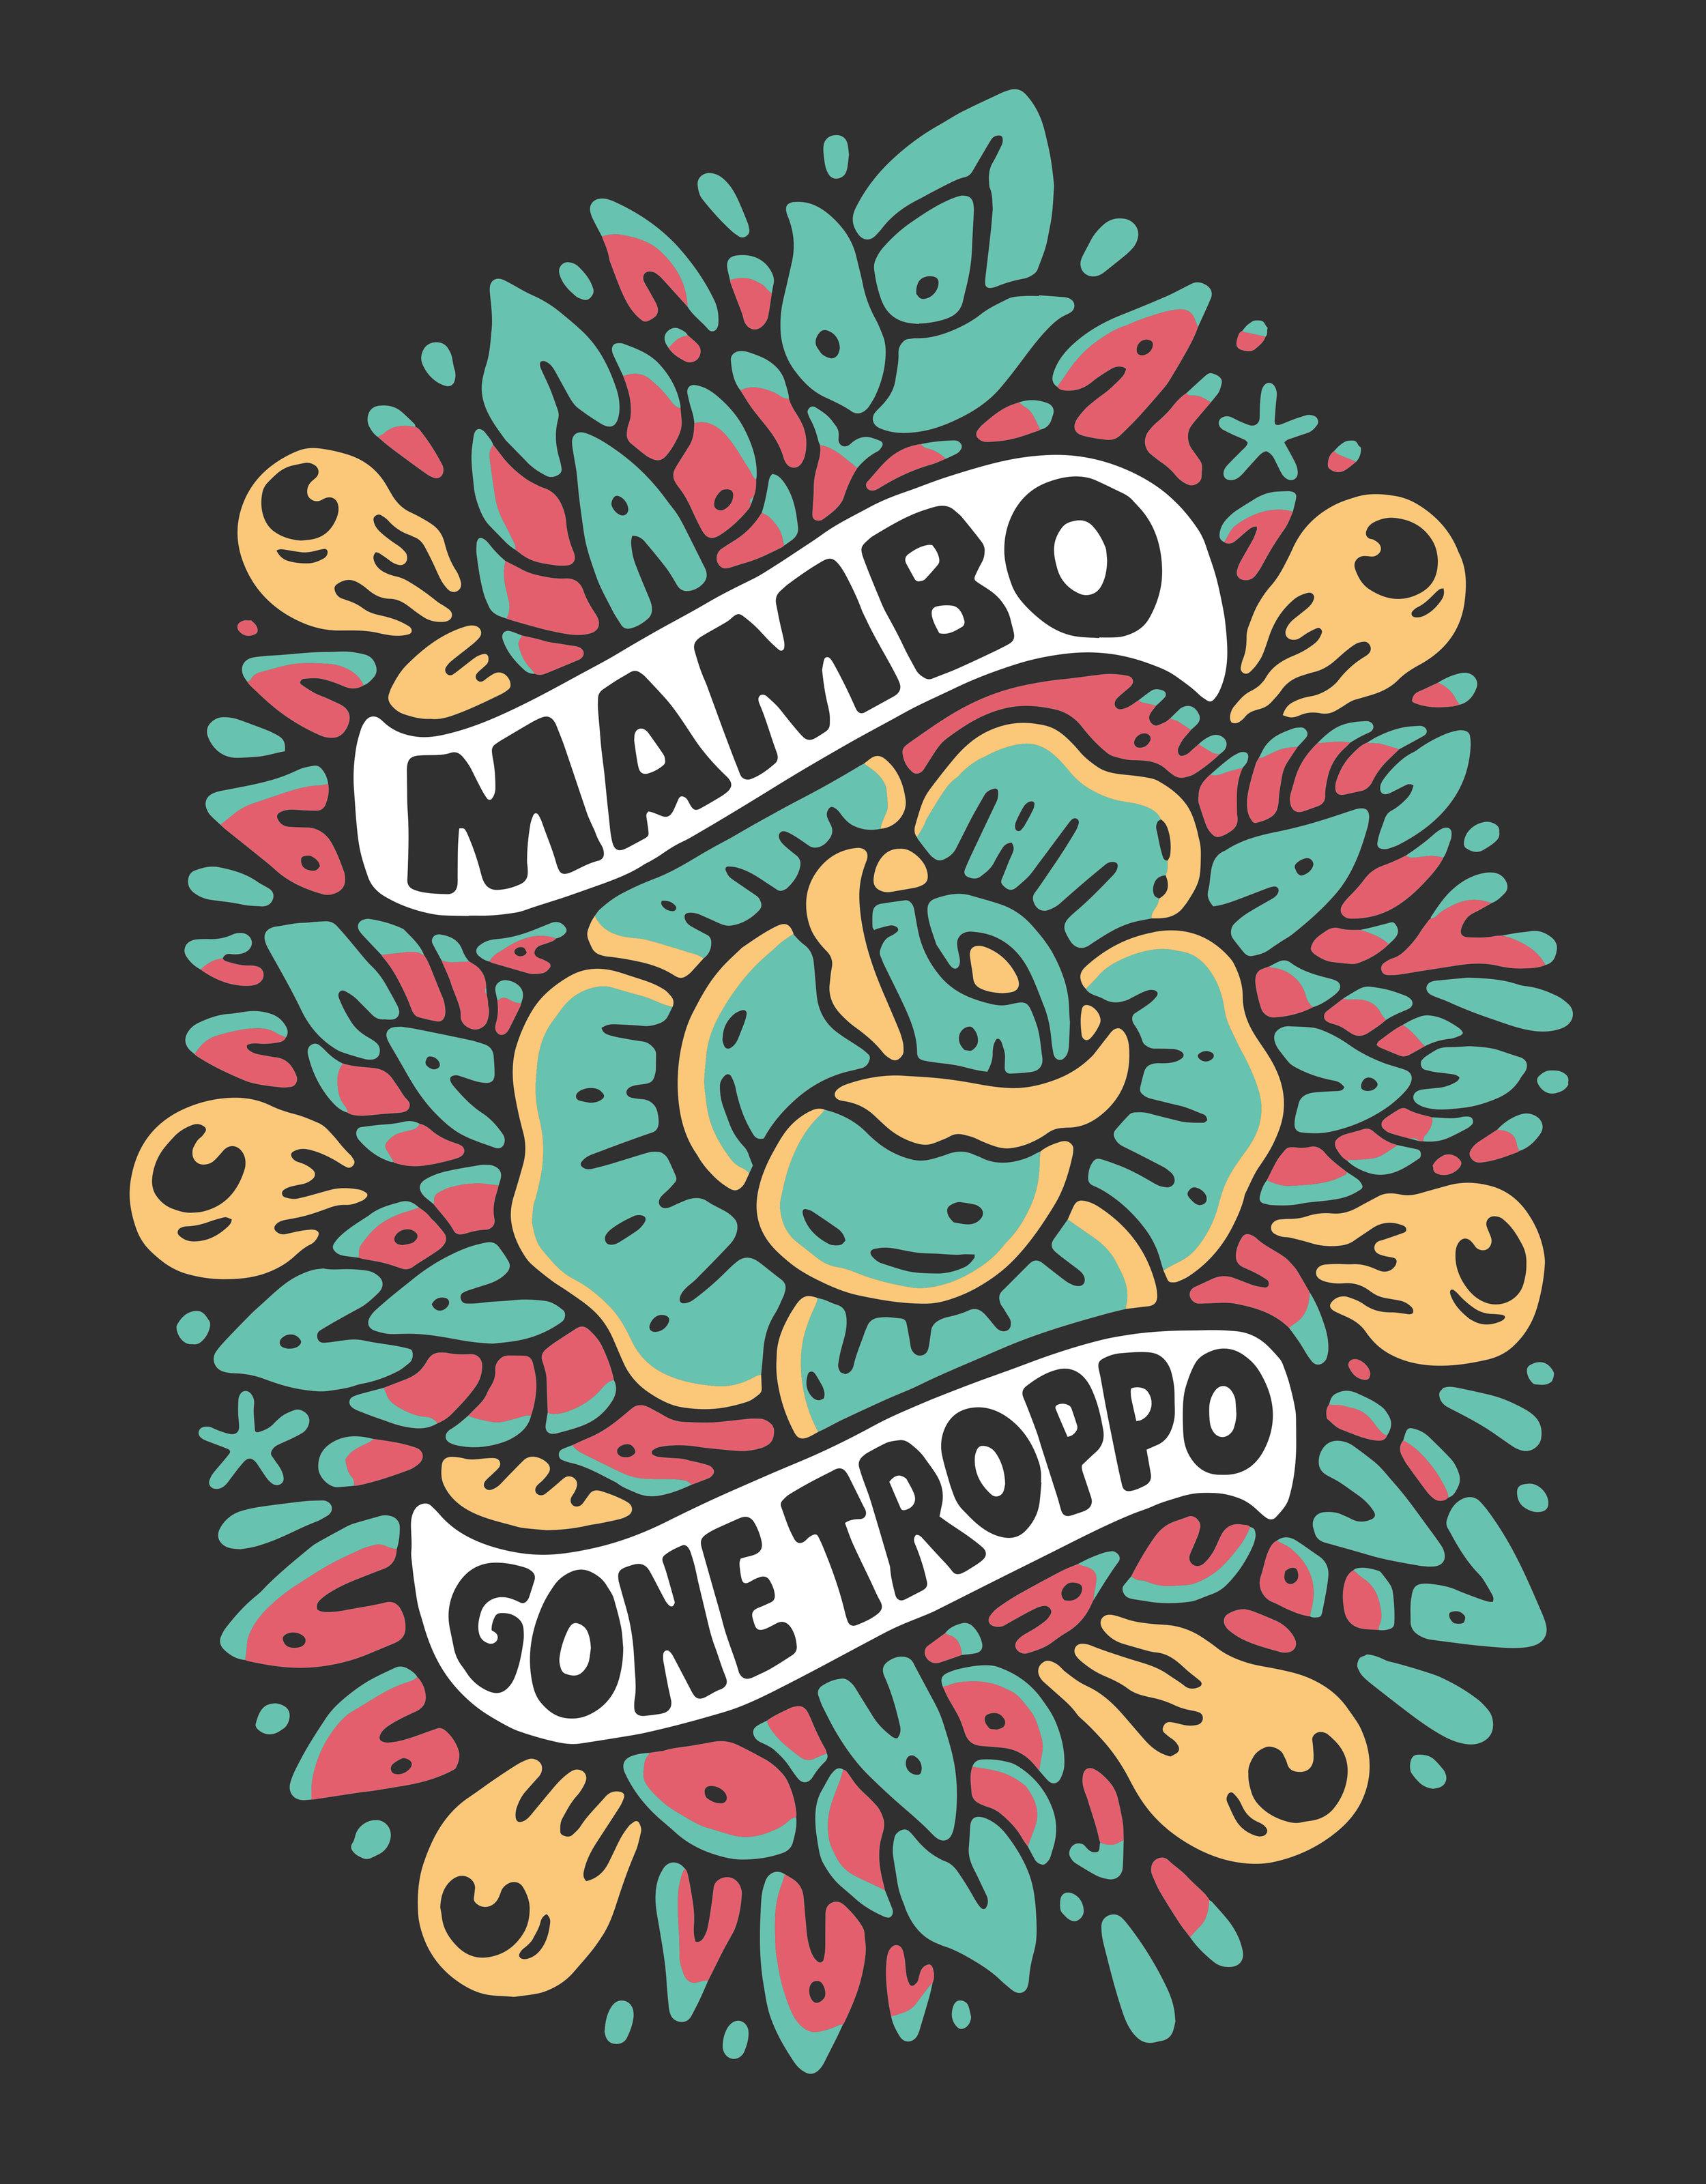 MAMBO - GONE TROPPO [BACKPRINT - 4 COLOUR - SINDY SINN] copy.jpg